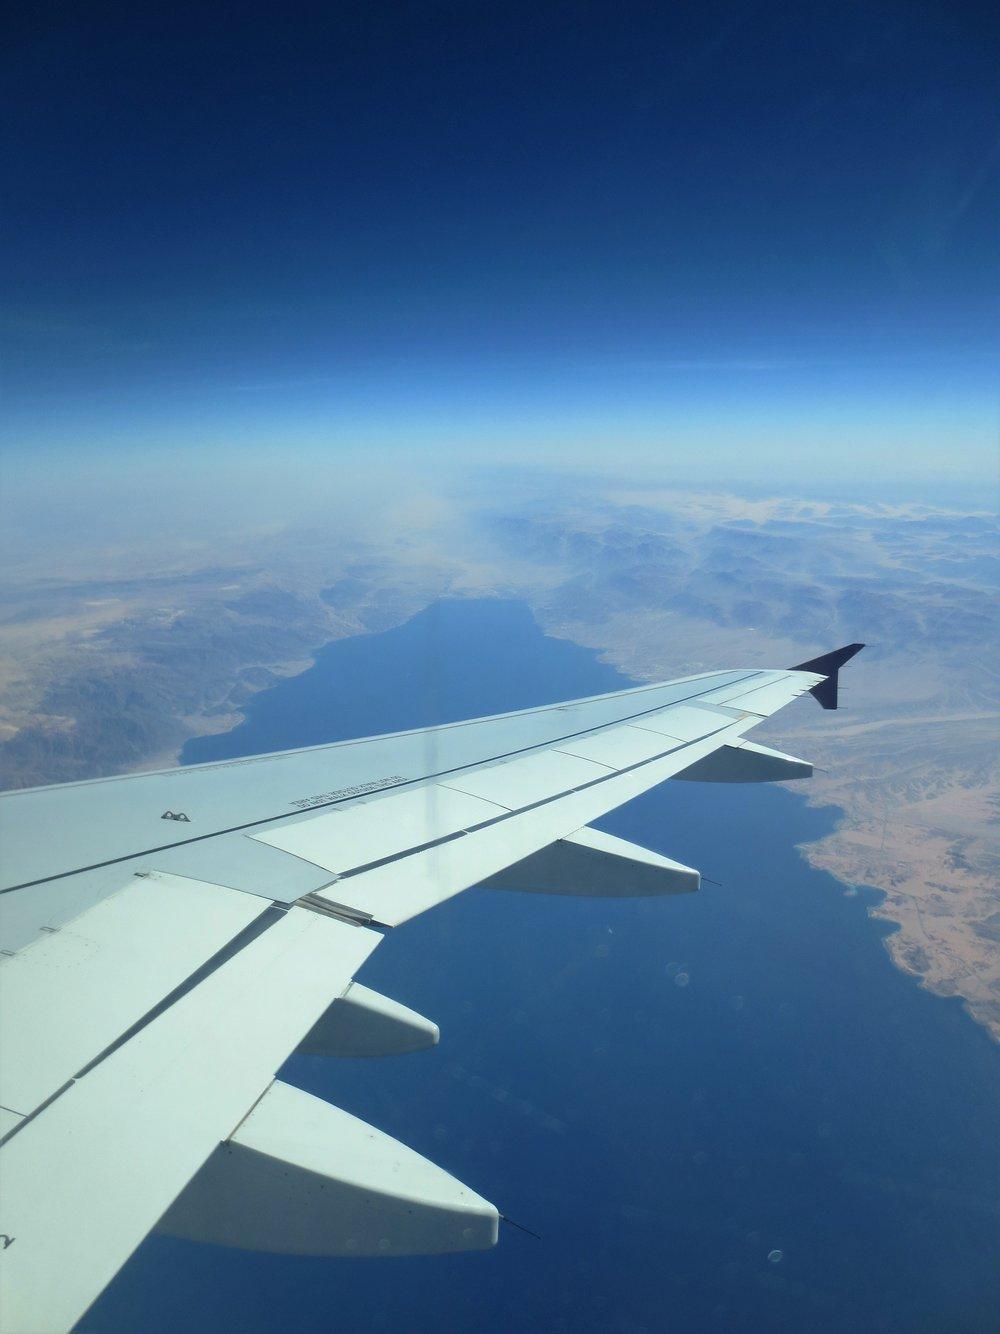 36000 feet above the Gulf of Aqaba through the window of a Qatar Airways Airbus 320